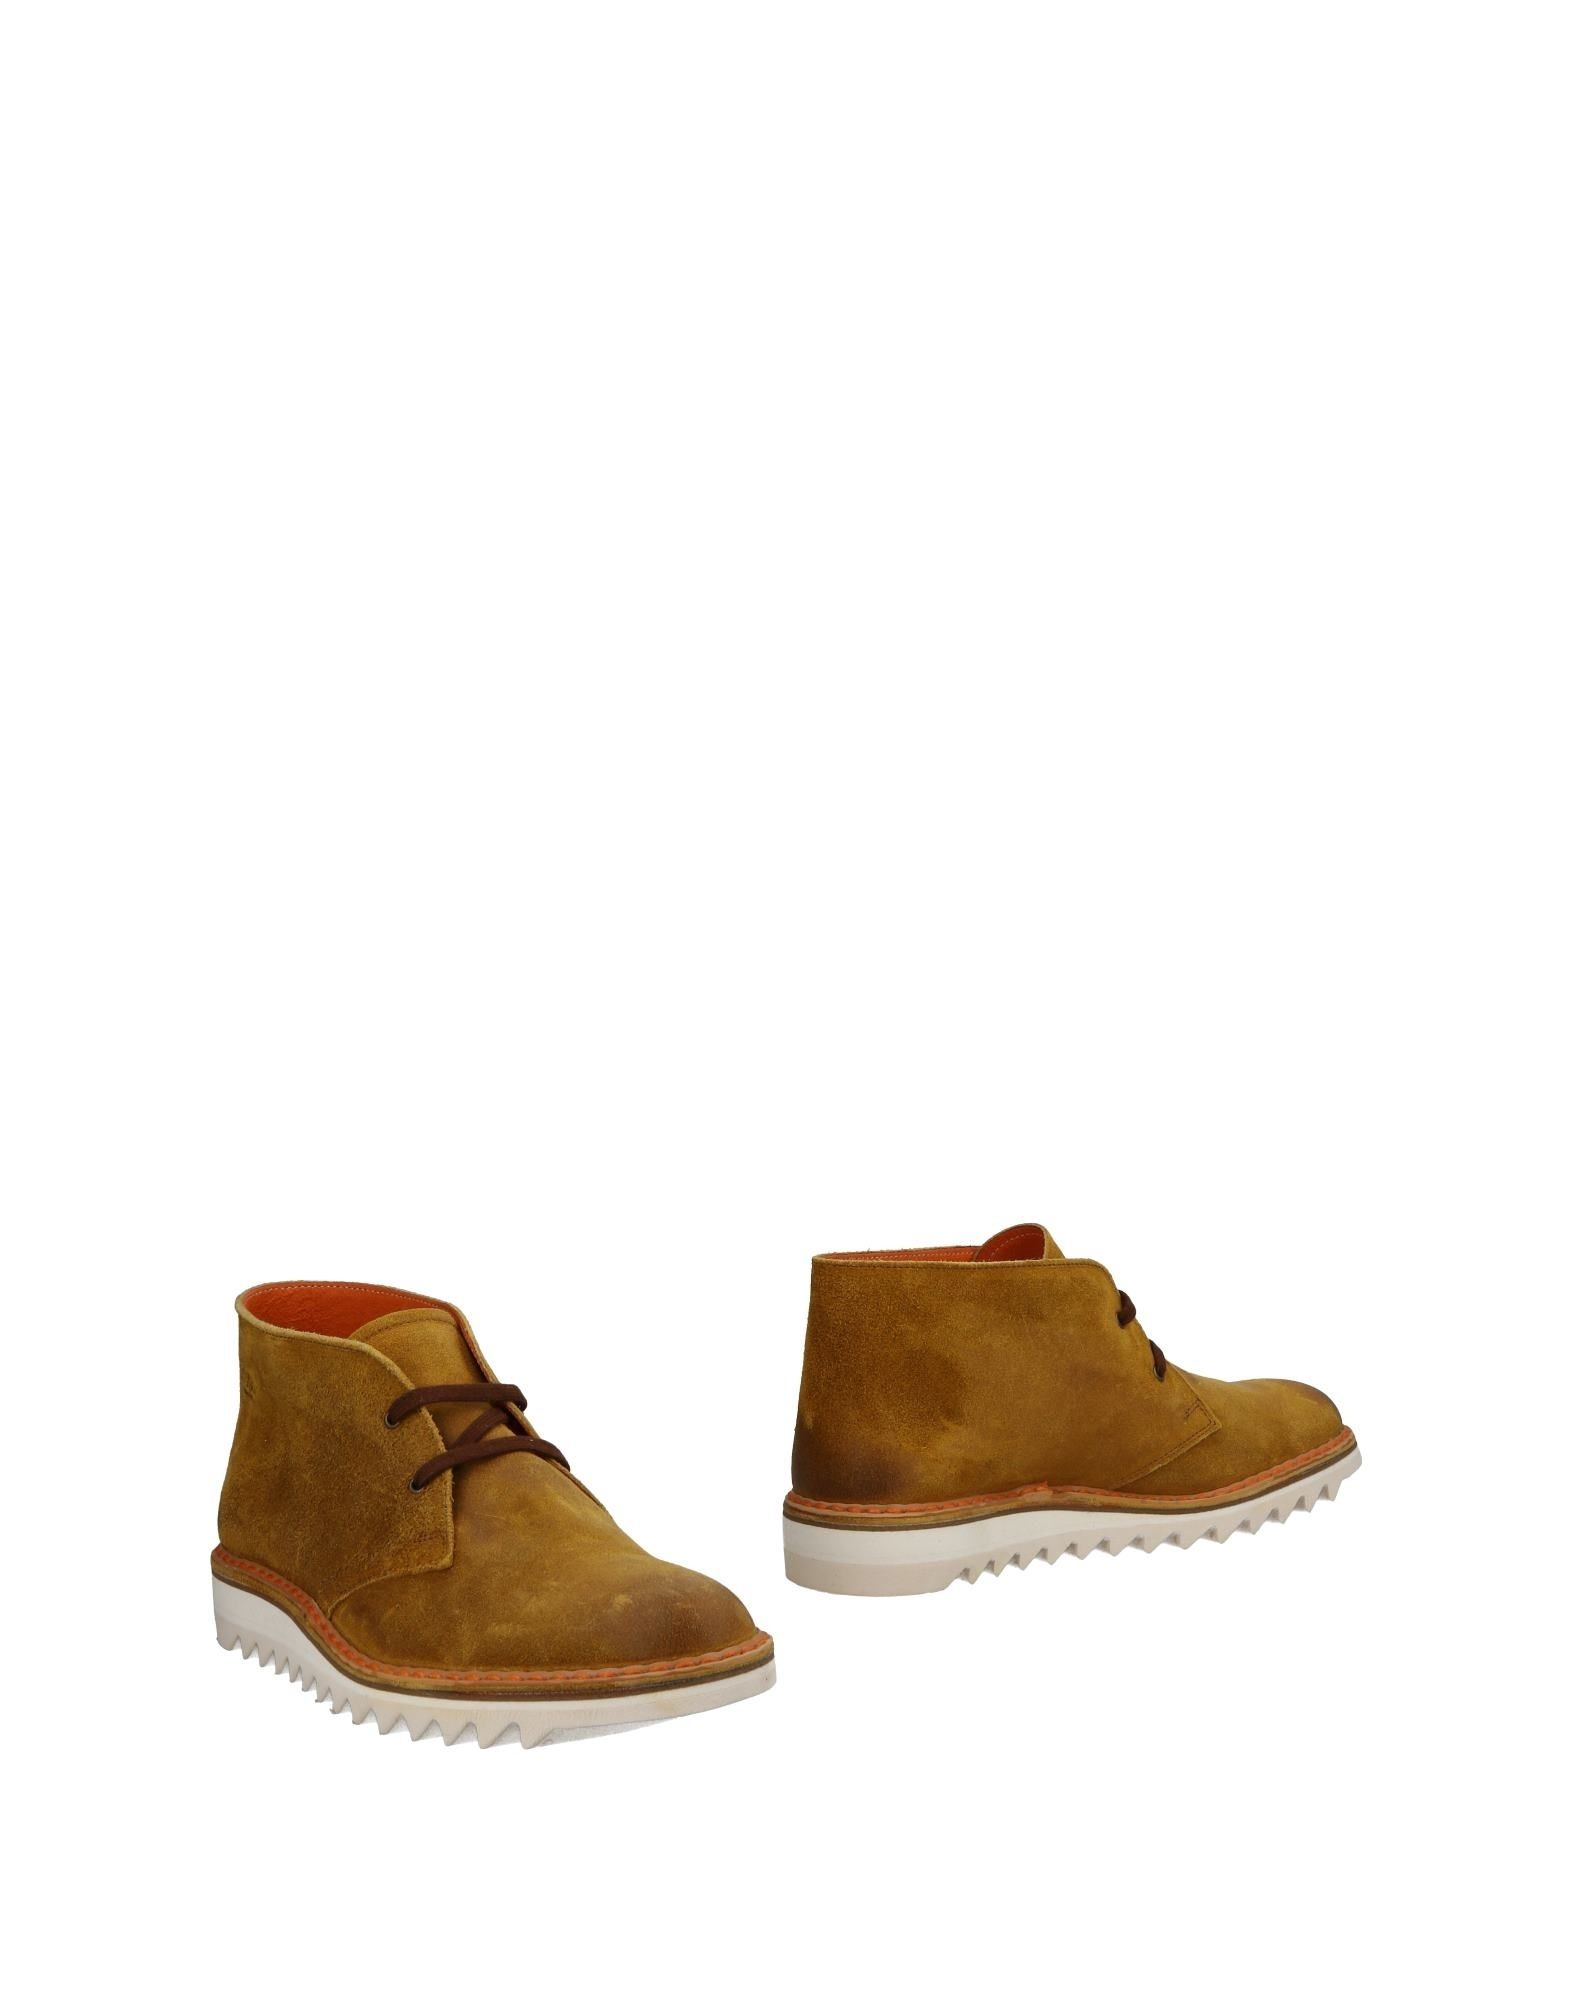 Rabatt echte Schuhe Ribbon Stiefelette 11490374IR Herren  11490374IR Stiefelette 74deac